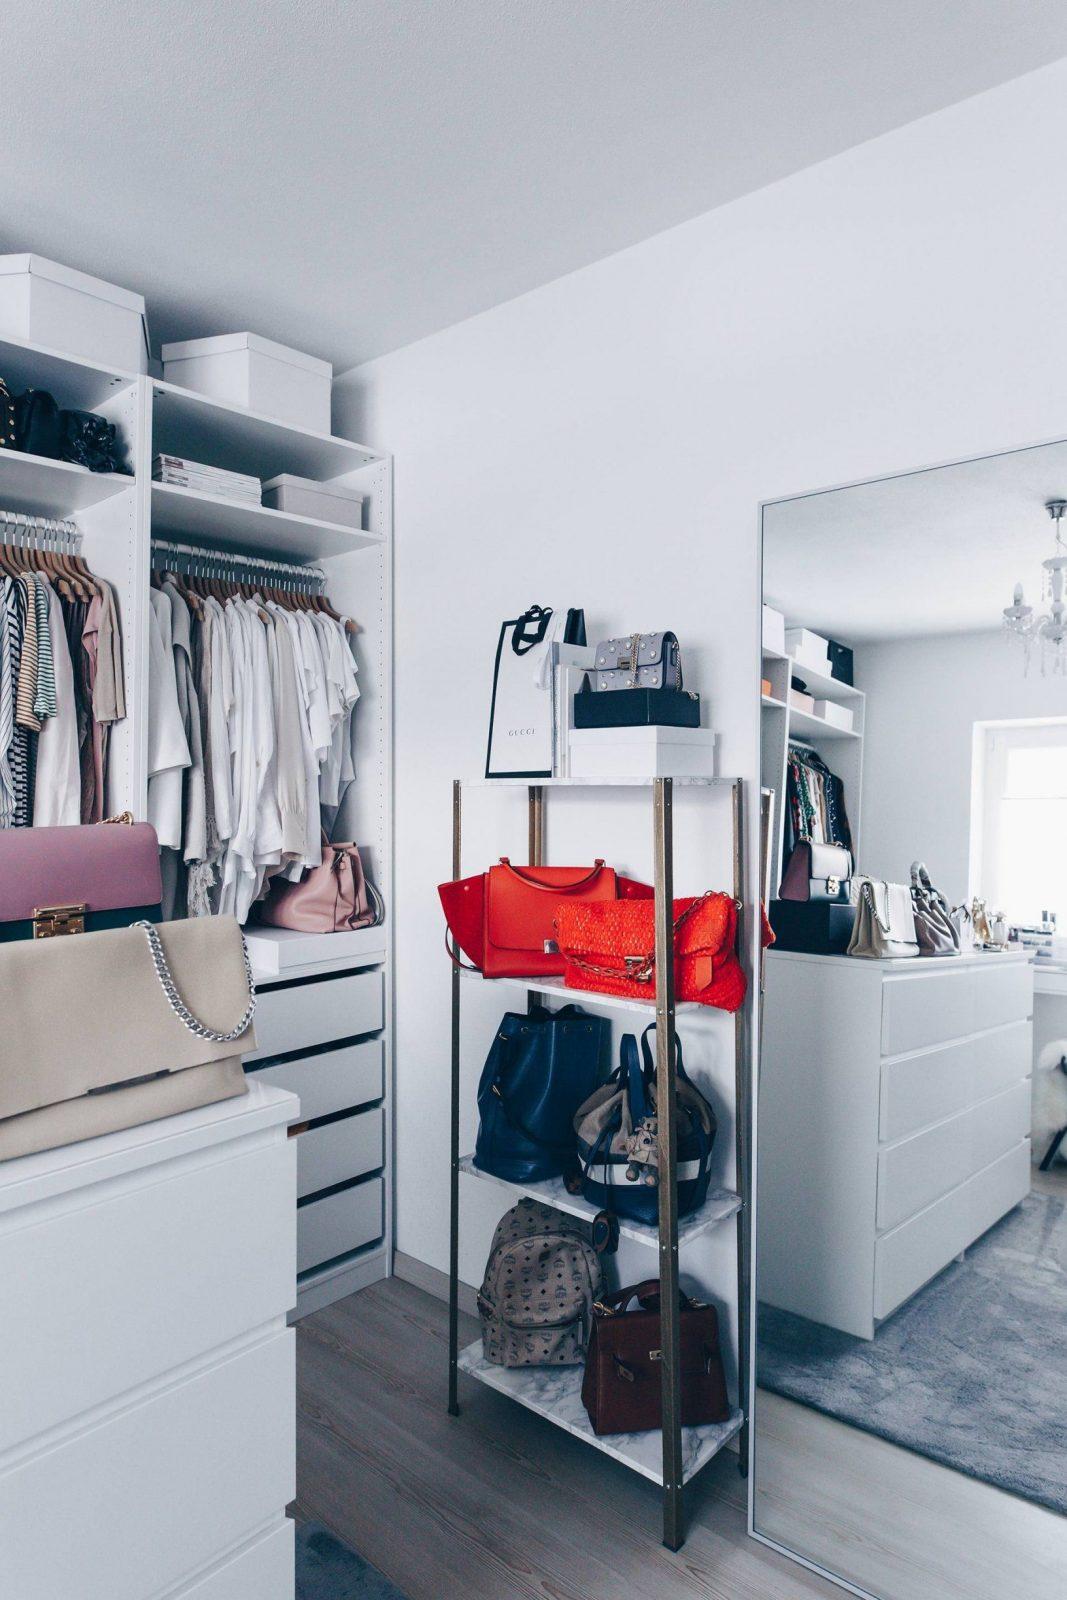 kleiderschrank konfigurieren ikea bettw sche 240x220 biber bettdecken 155x240 bierbaum. Black Bedroom Furniture Sets. Home Design Ideas